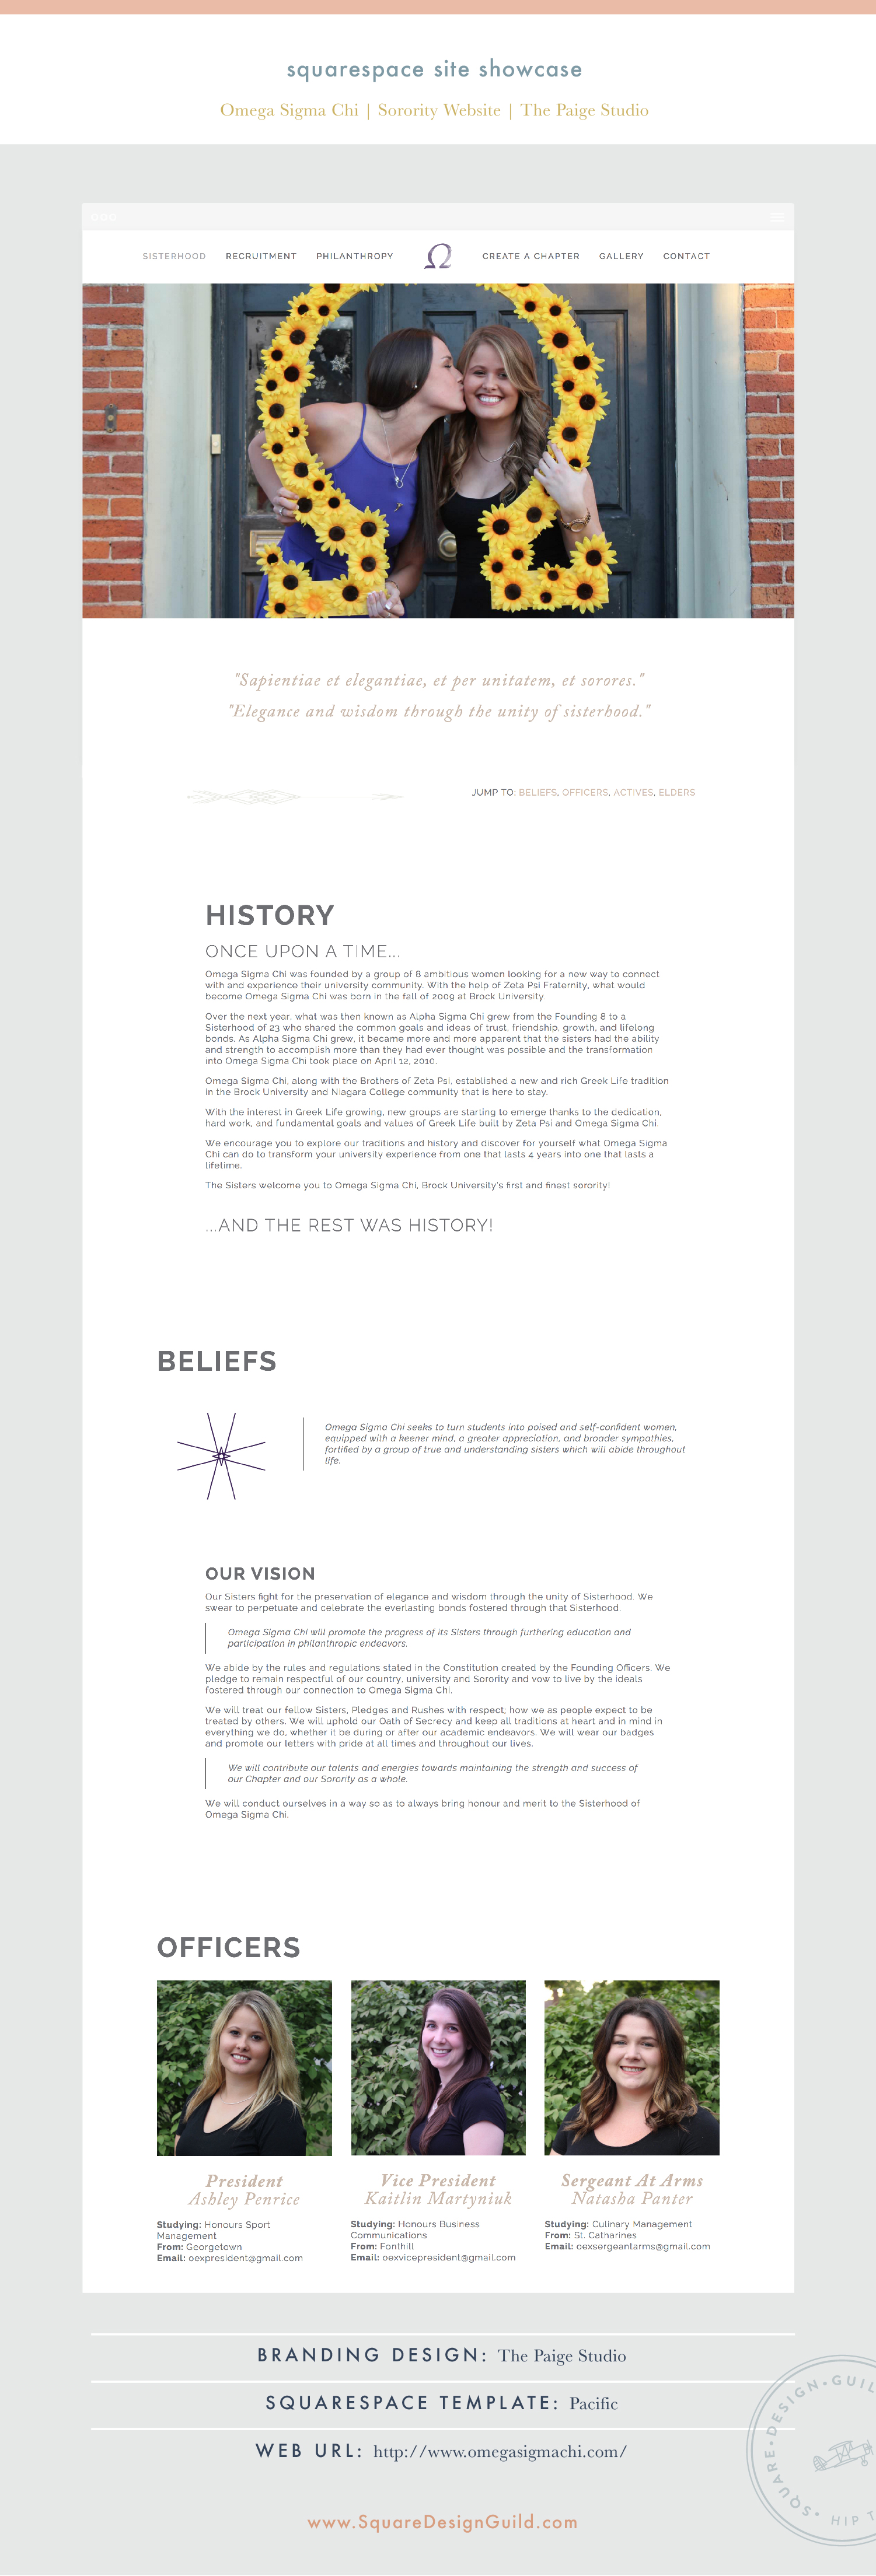 Square Design Guild | Squarespace Site Showcase: Omega Sigma Chi Sorority | Sorority Website on Pacific